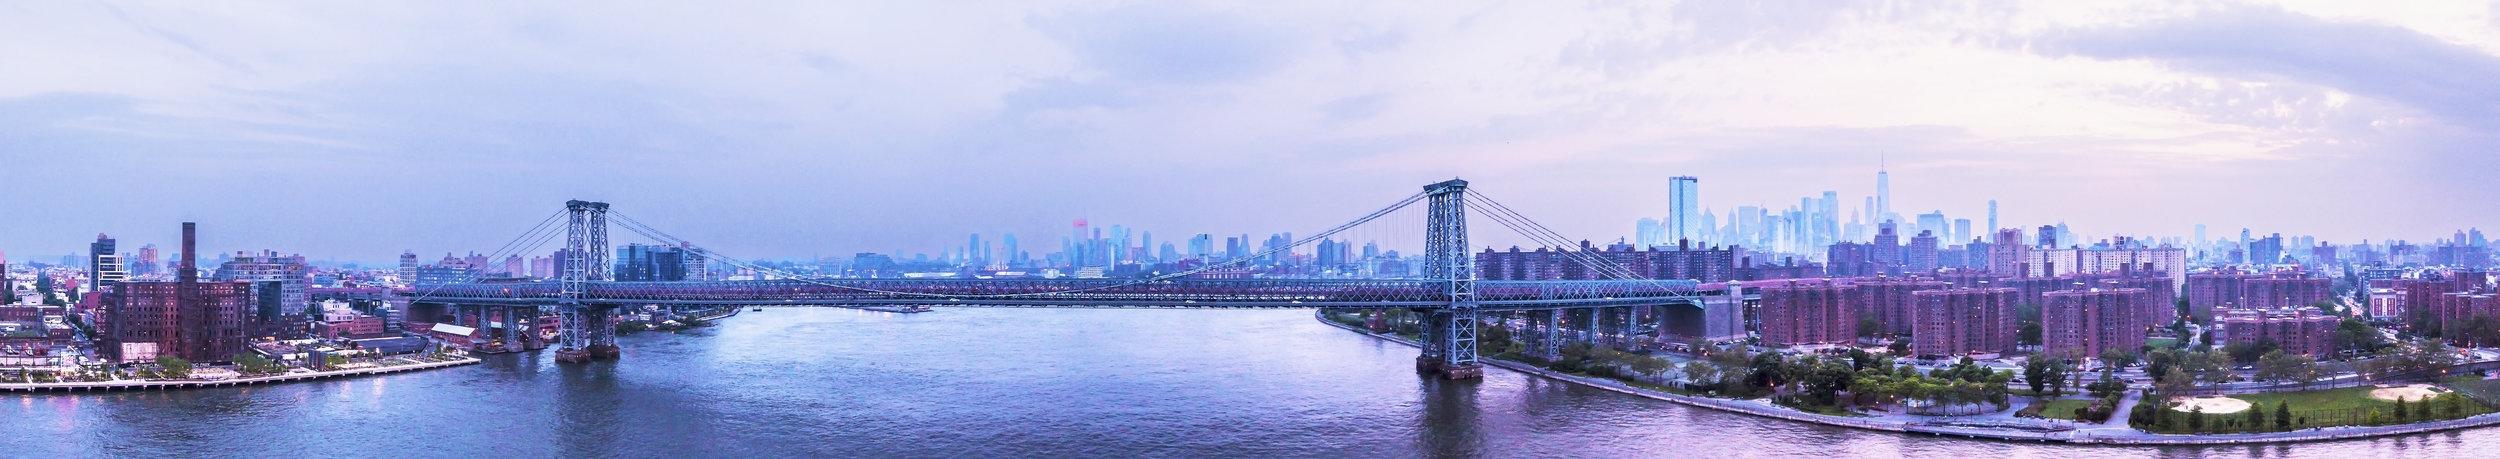 Bridge Pano 6.jpg